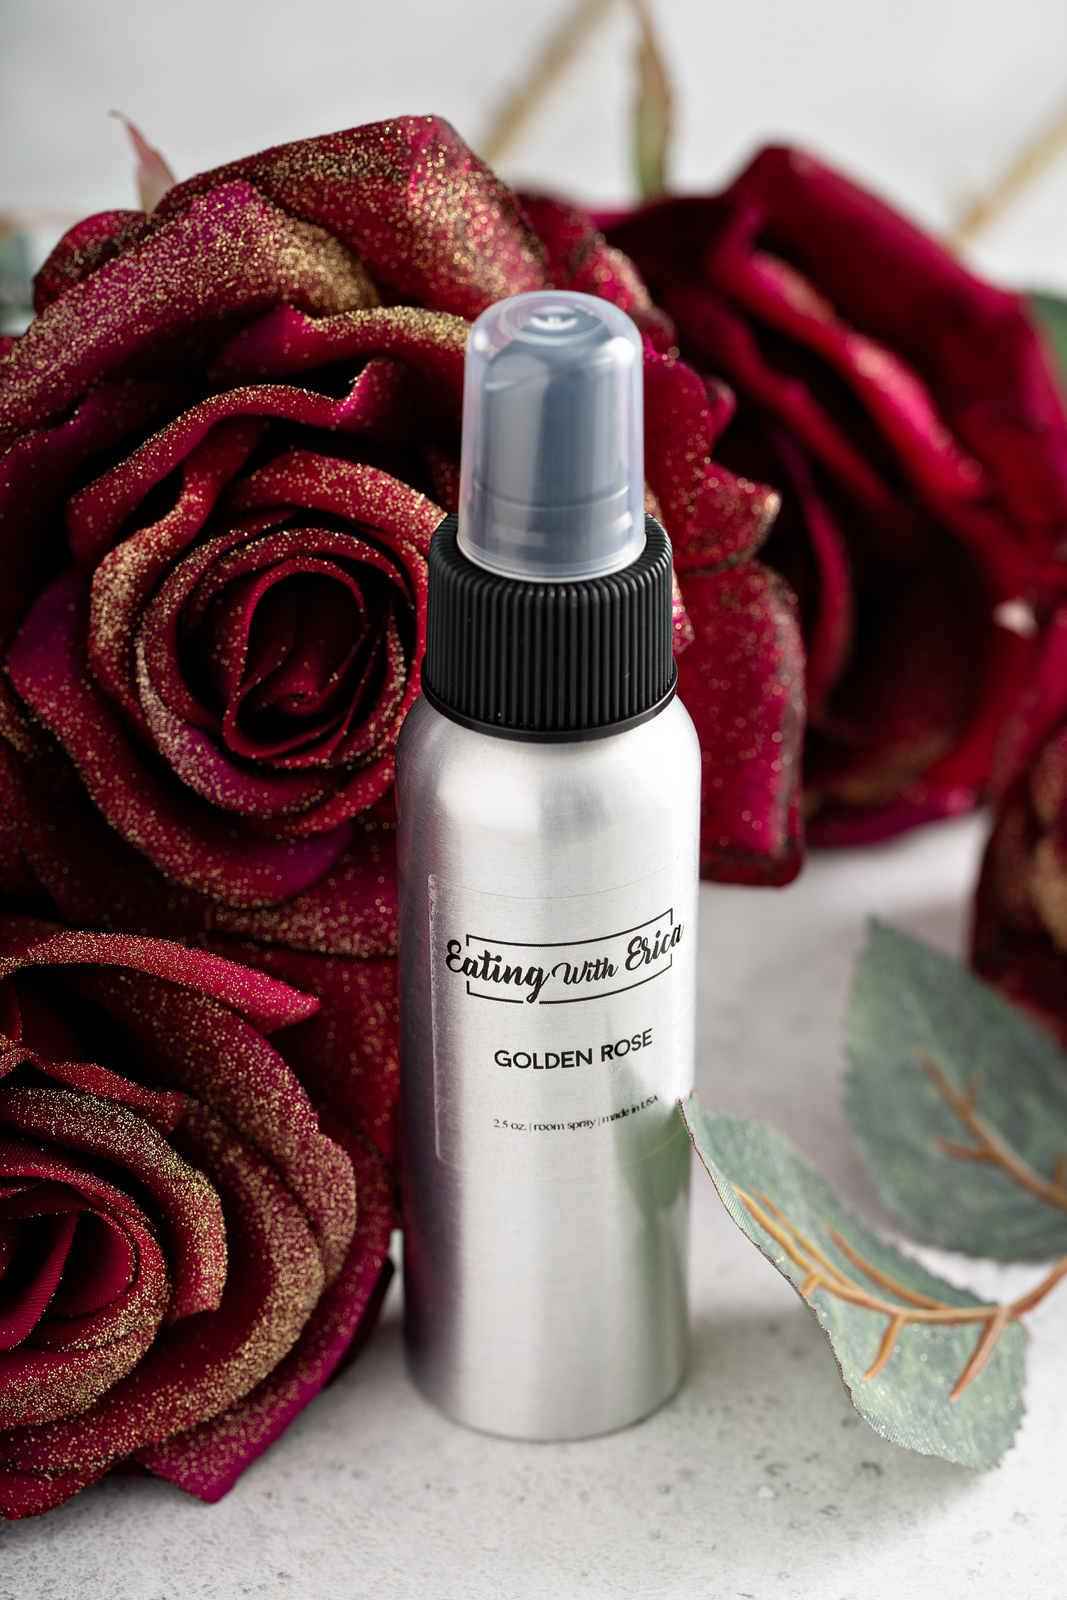 Golden Rose Rose Spray